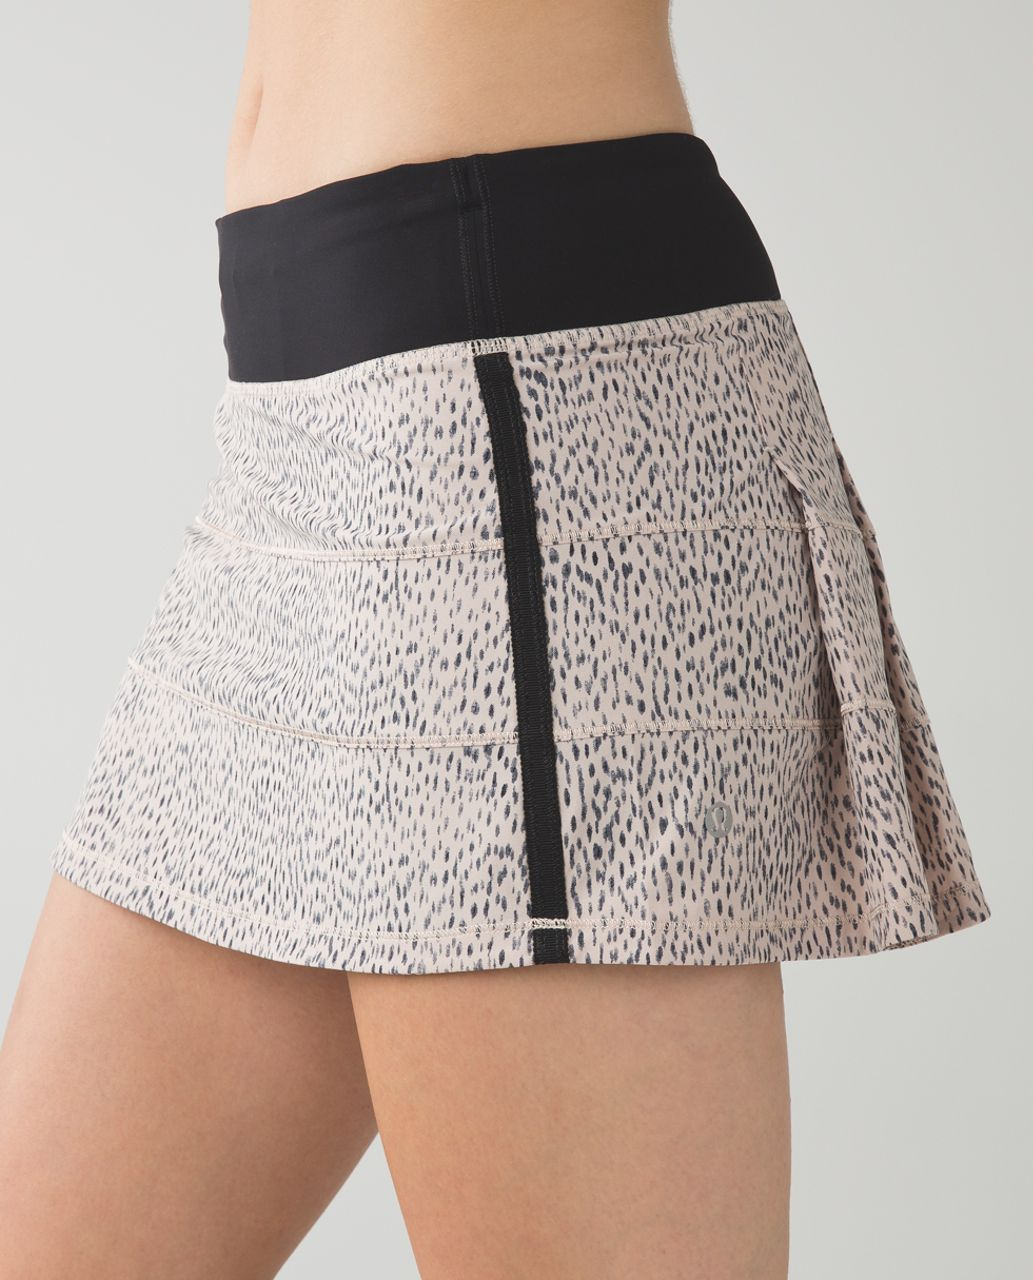 Lululemon Pace Rival Skirt II *4-way Stretch (Regular) - Dottie Dash Grain Black / Black